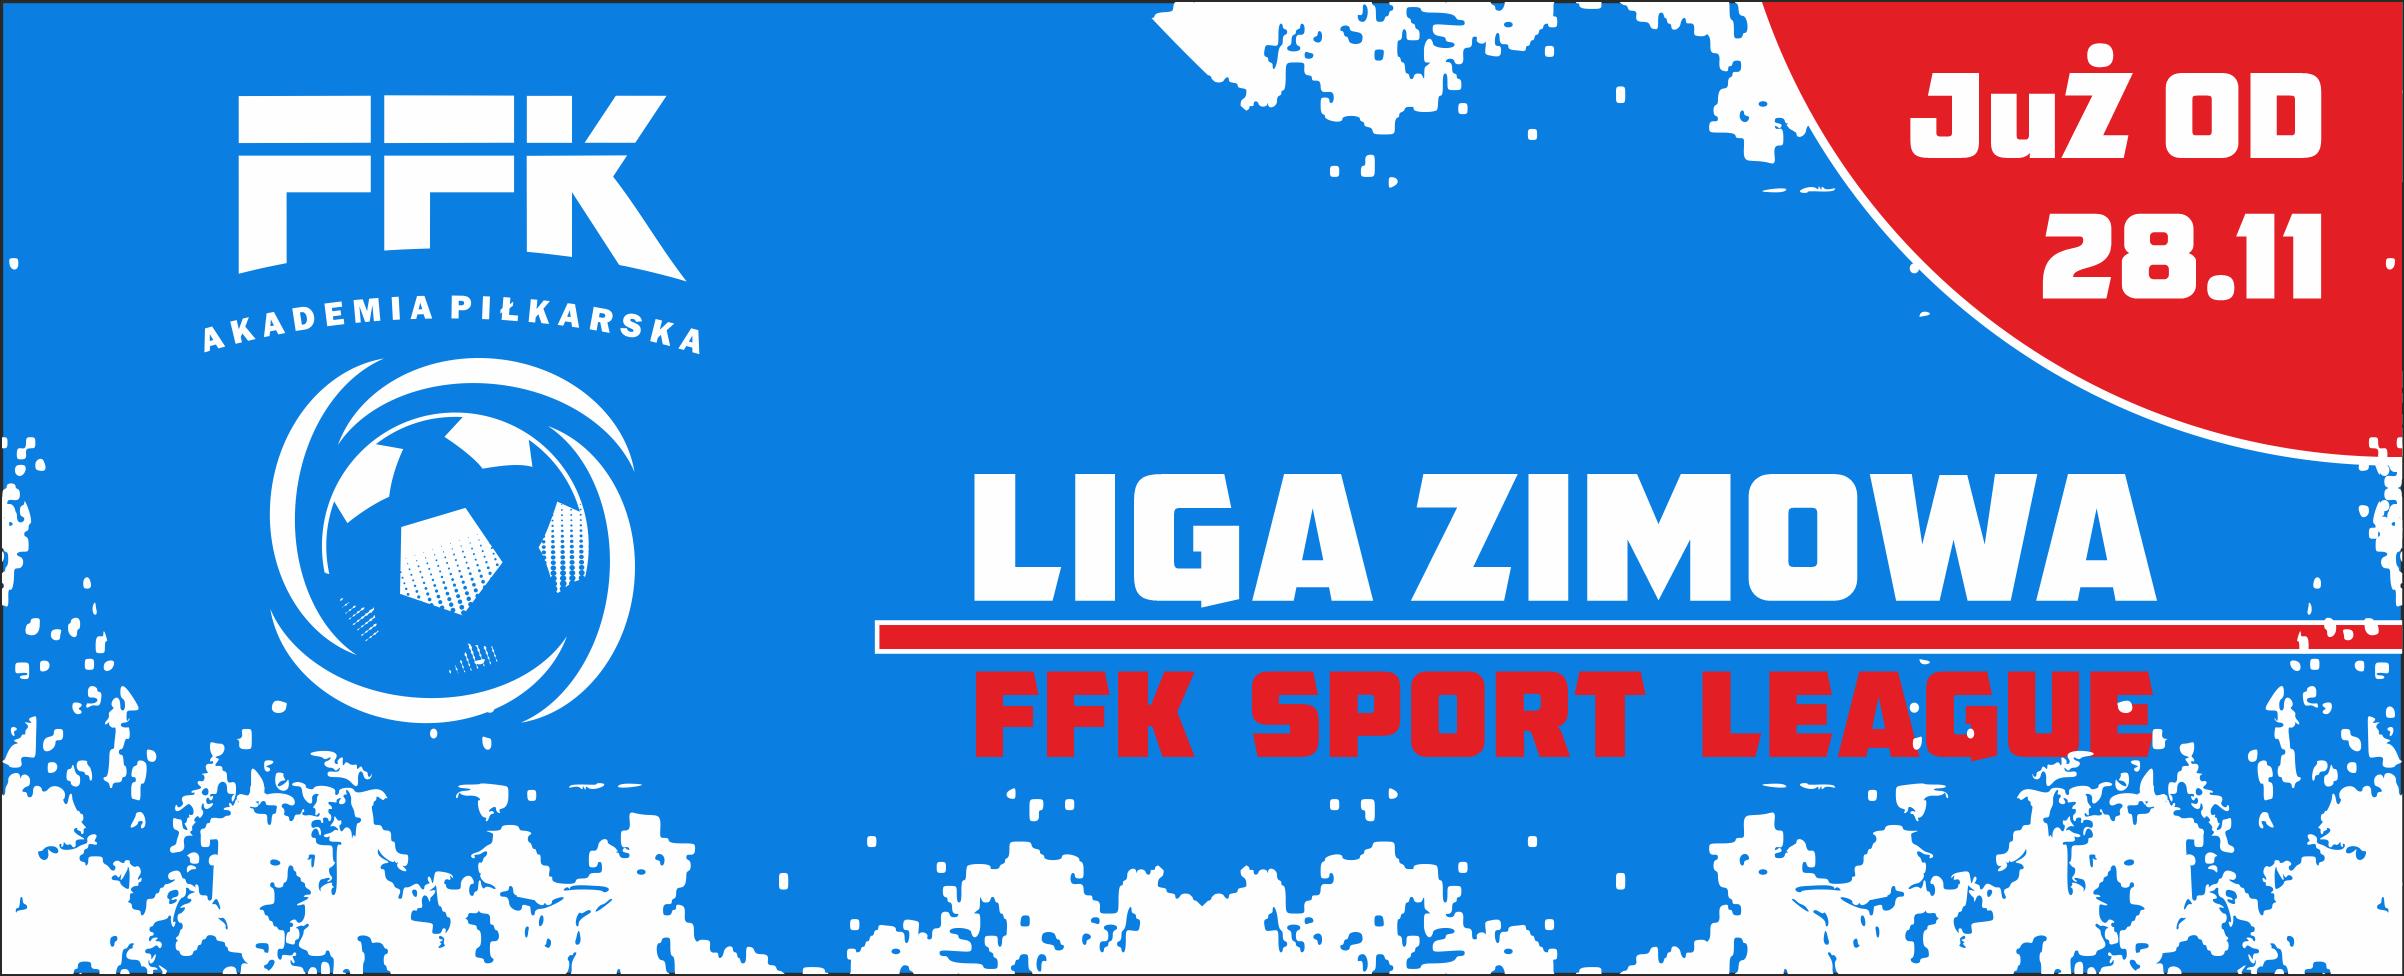 1 SLIDER ffk sport league 28.11